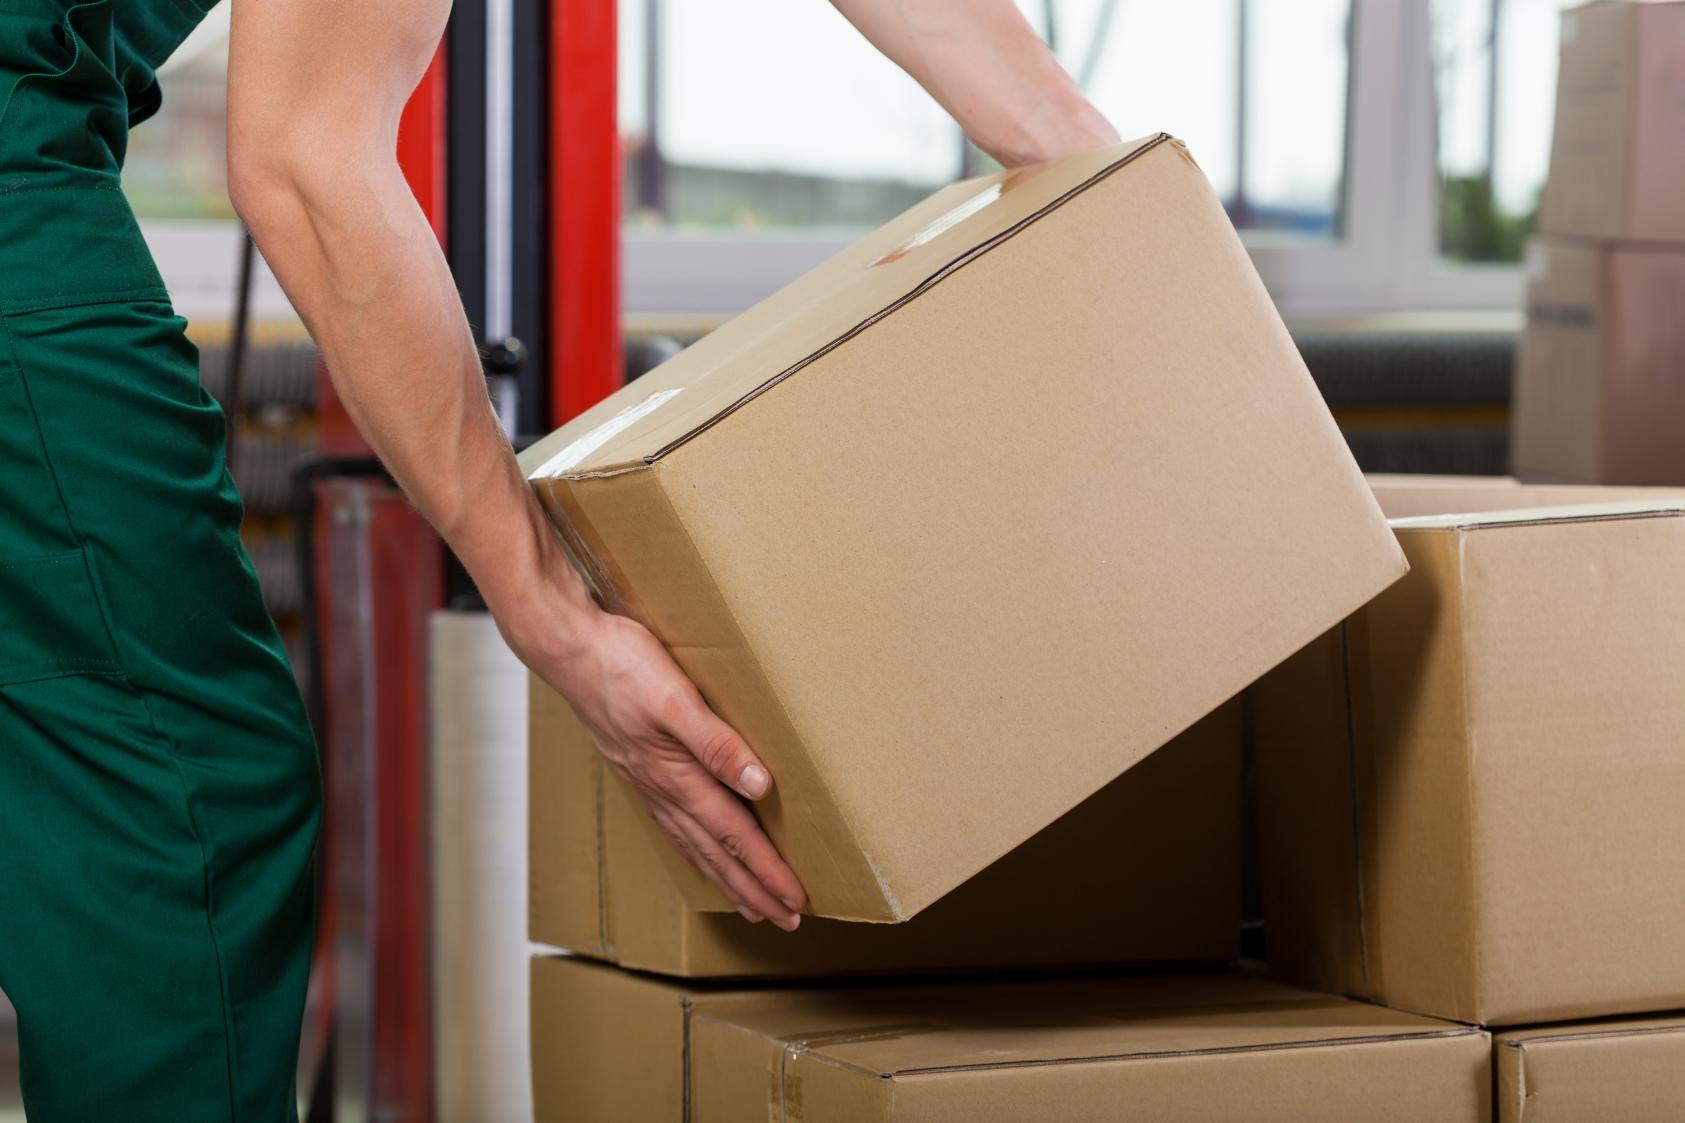 bpost acquires Radial, formerly eBay enterprise, for $820M